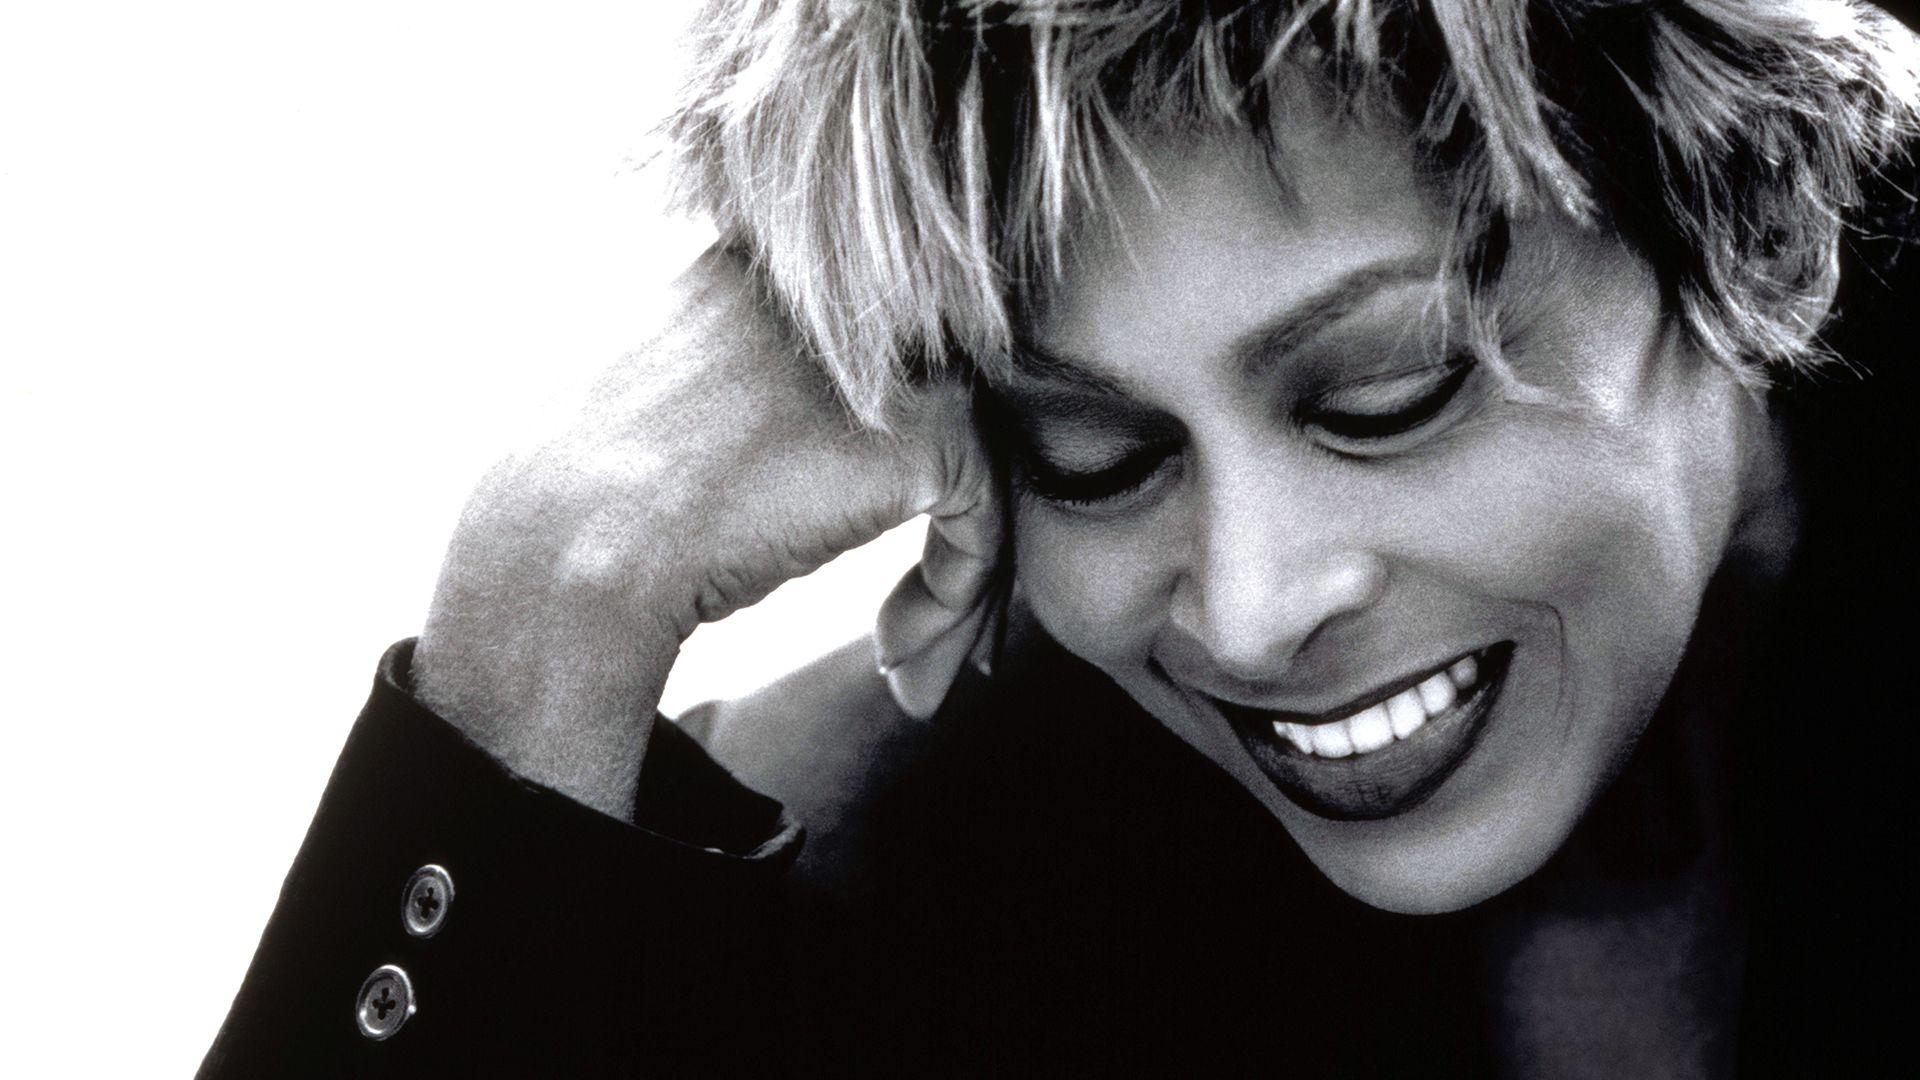 Buon compleanno Tina Turner